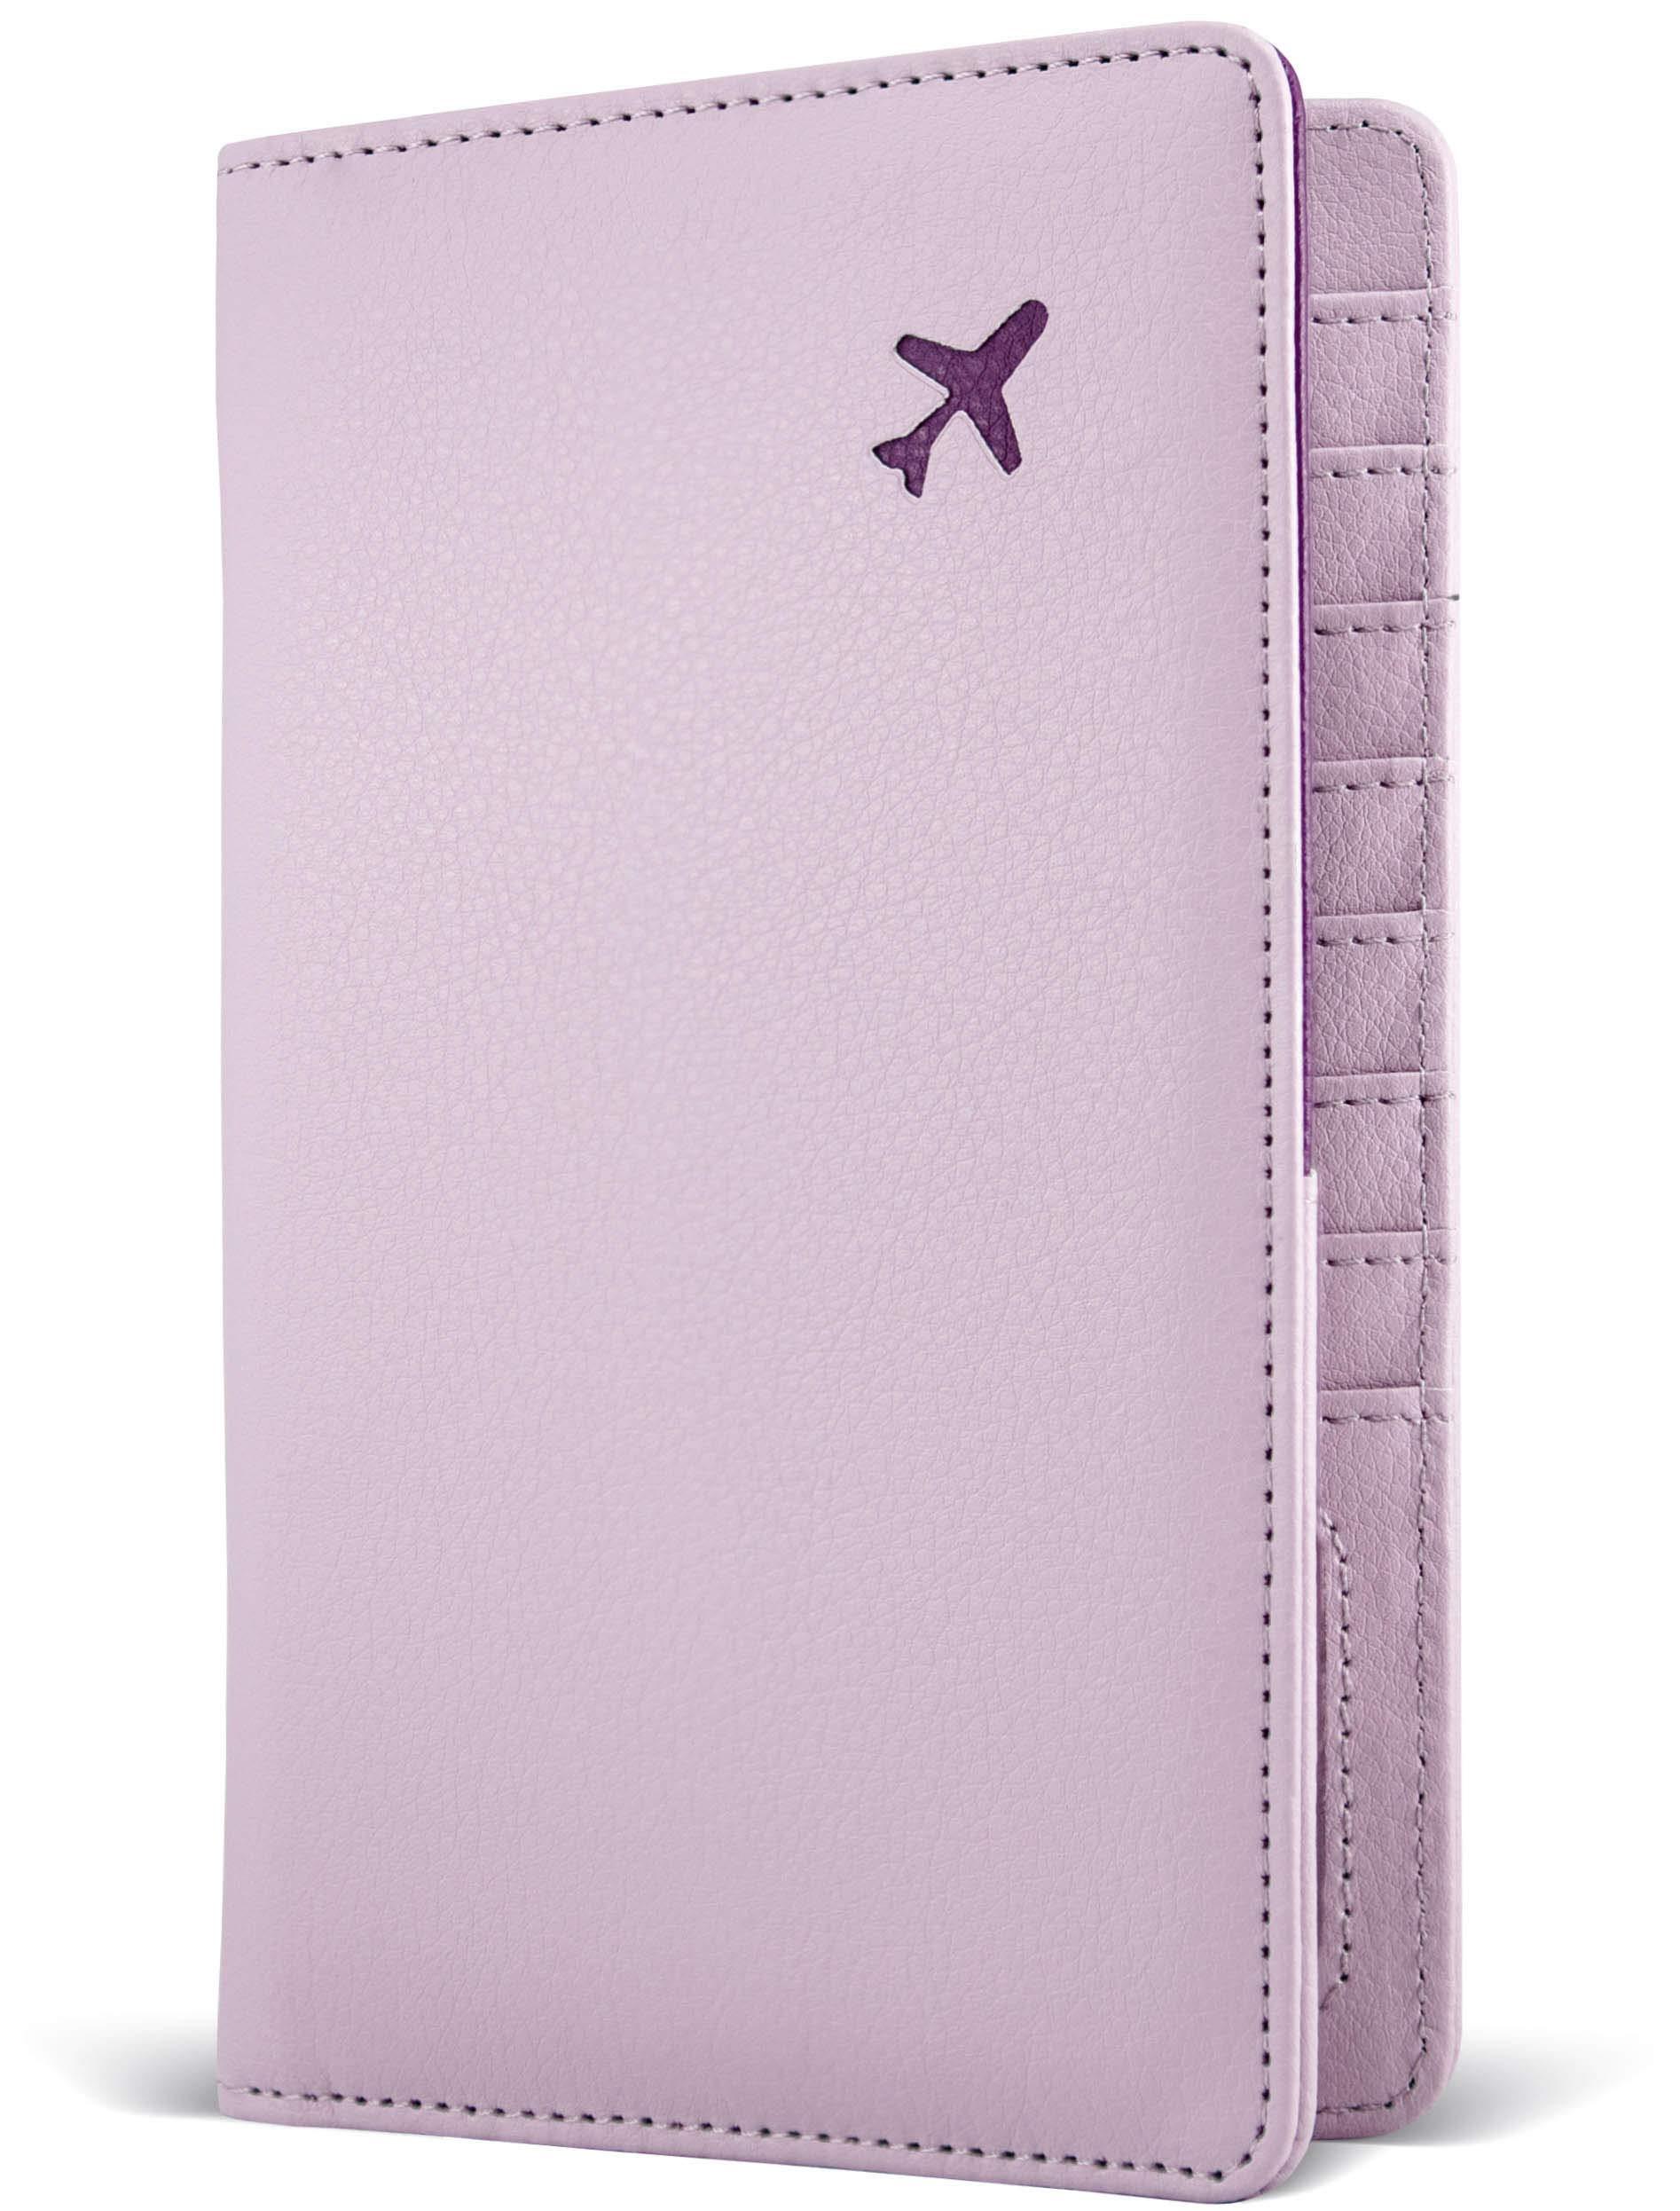 Passport Holder by POCKT - RFID Blocking Travel Wallet for Safe Trip, Document Organizer + Gift Box   Lavender